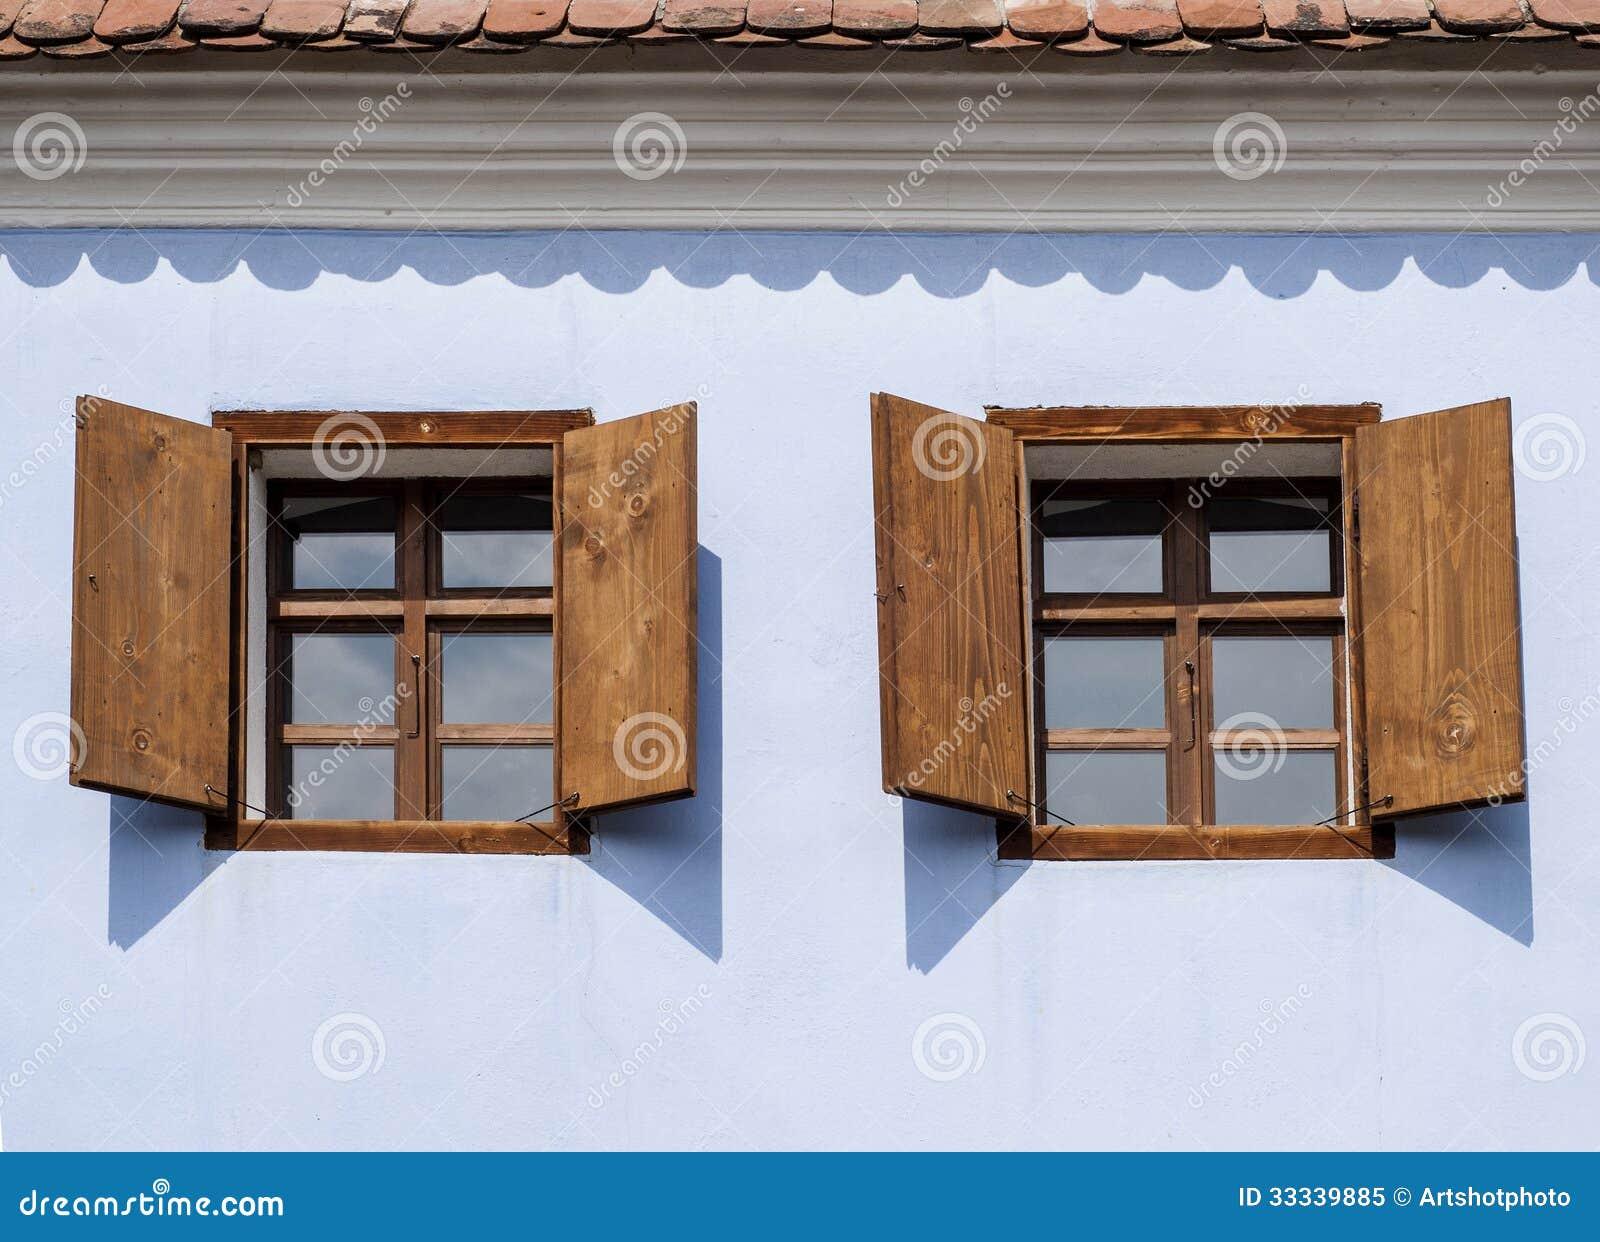 Rustic Wood Windows Royalty Free Stock Photo - Image: 33339885